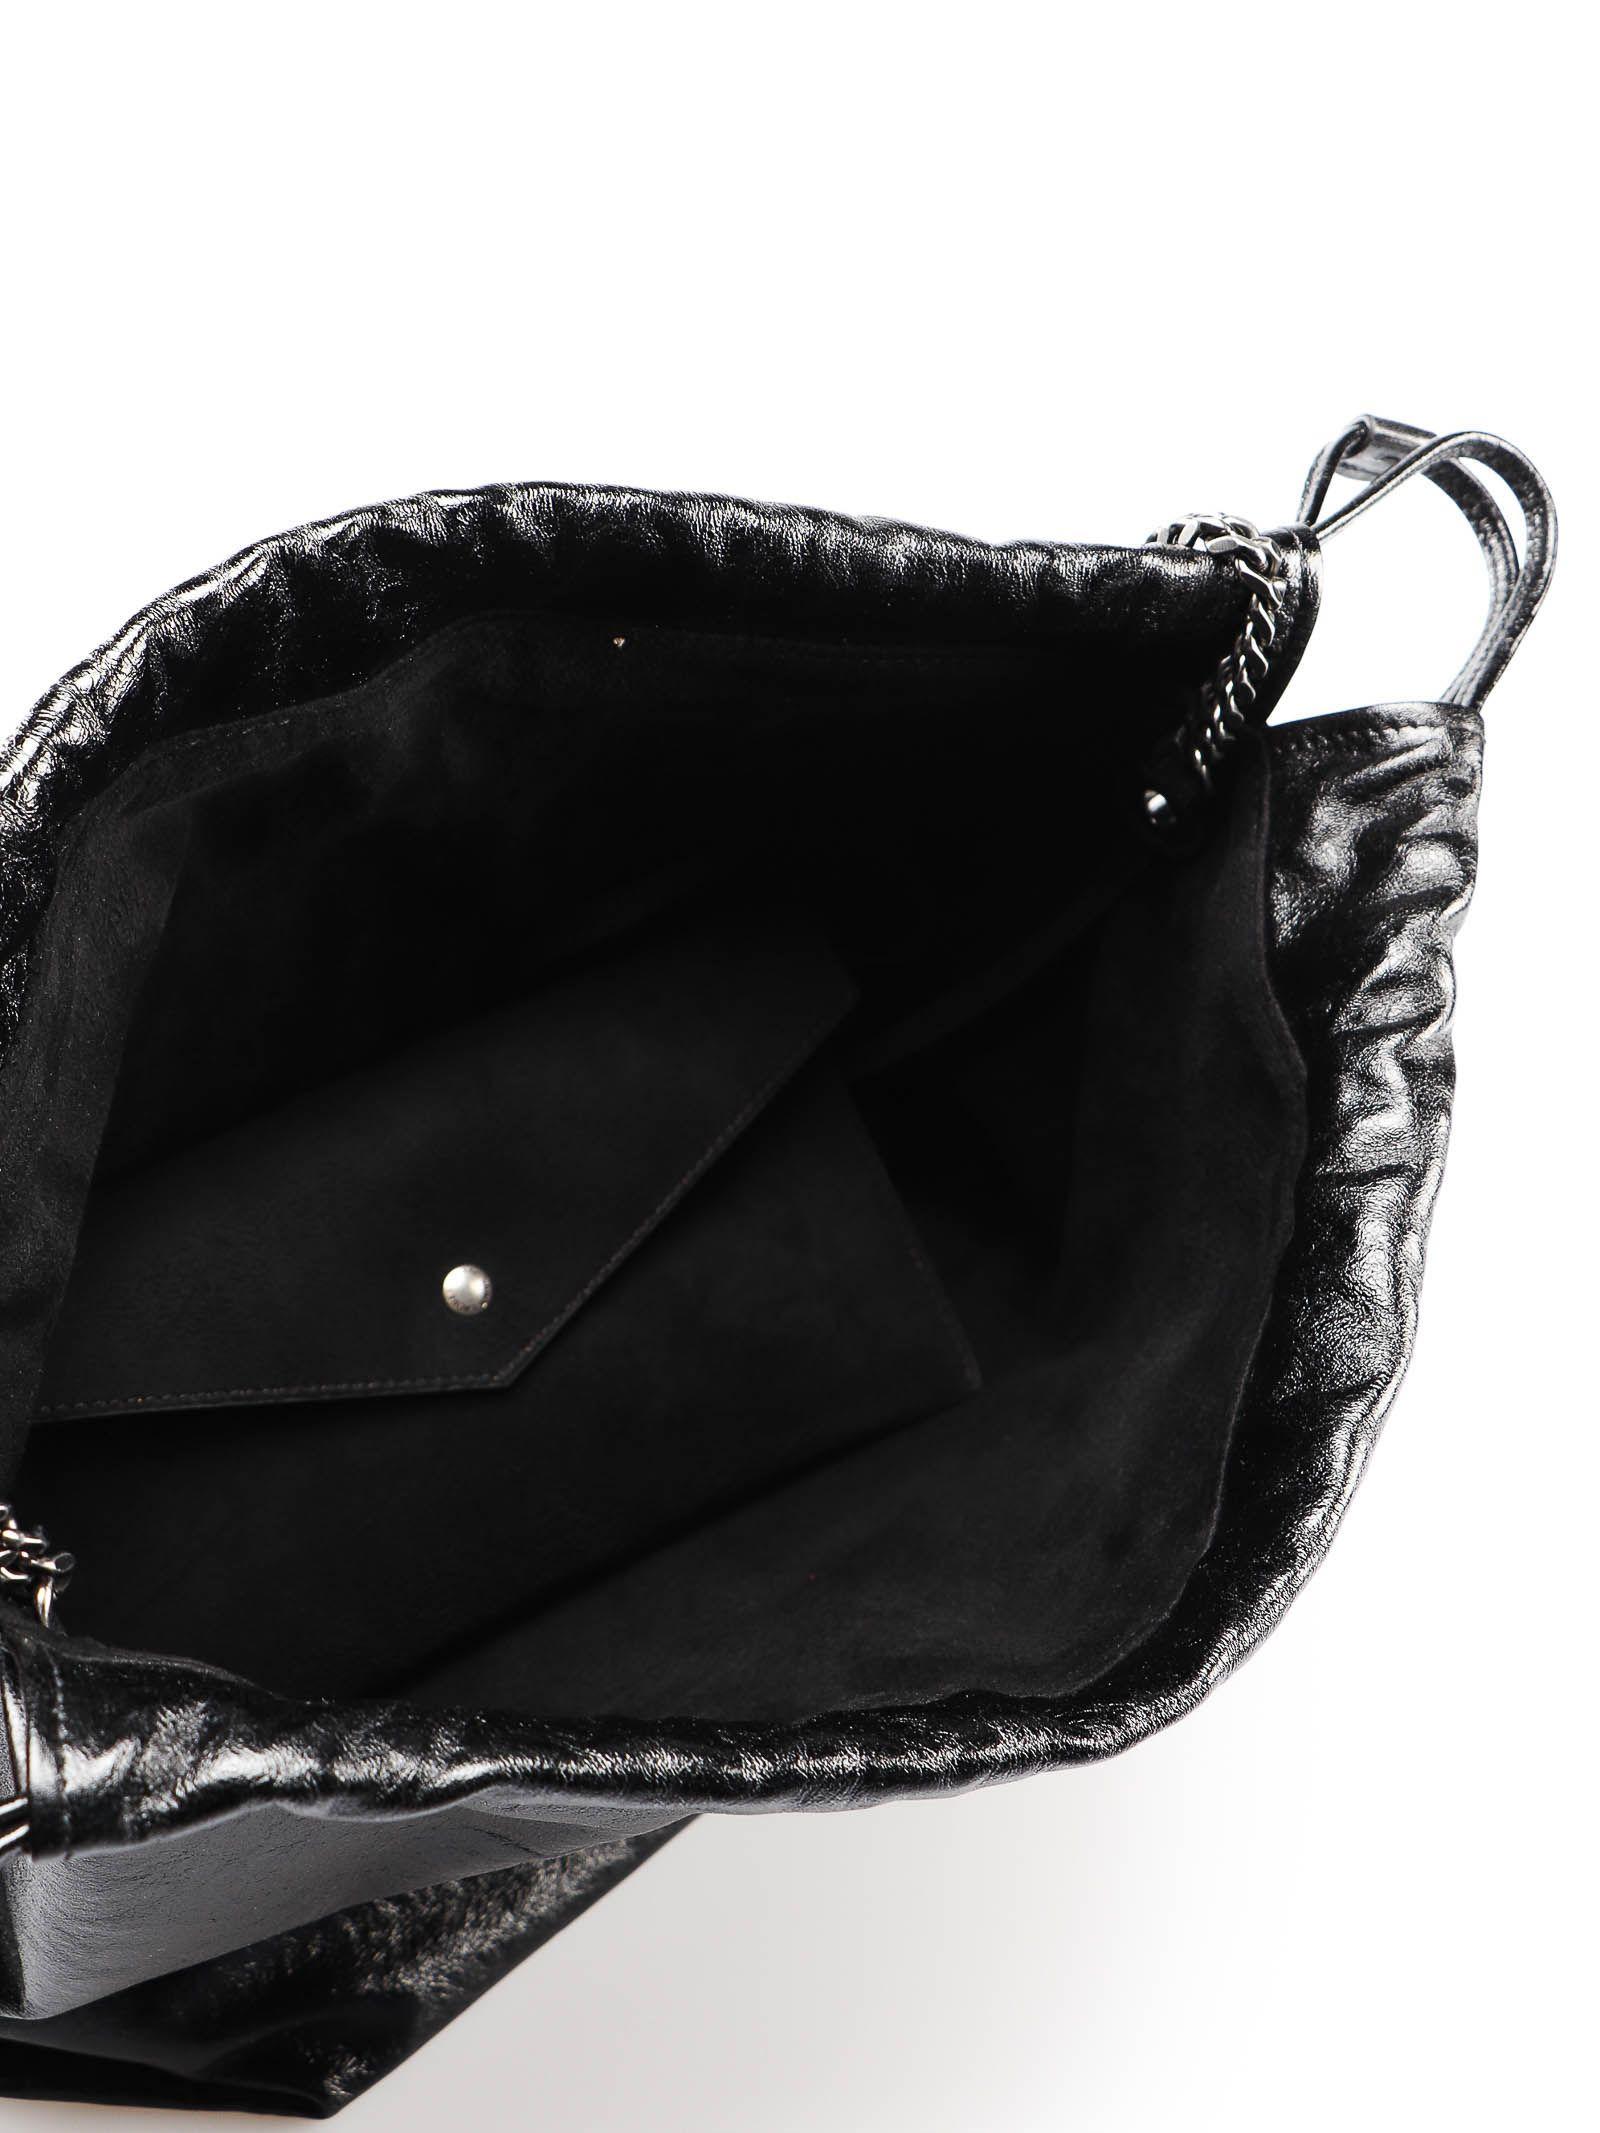 Saint Laurent Saint Laurent Teddy Sac Bucket Bag - Black - 10866861 ... 69f704d57af02